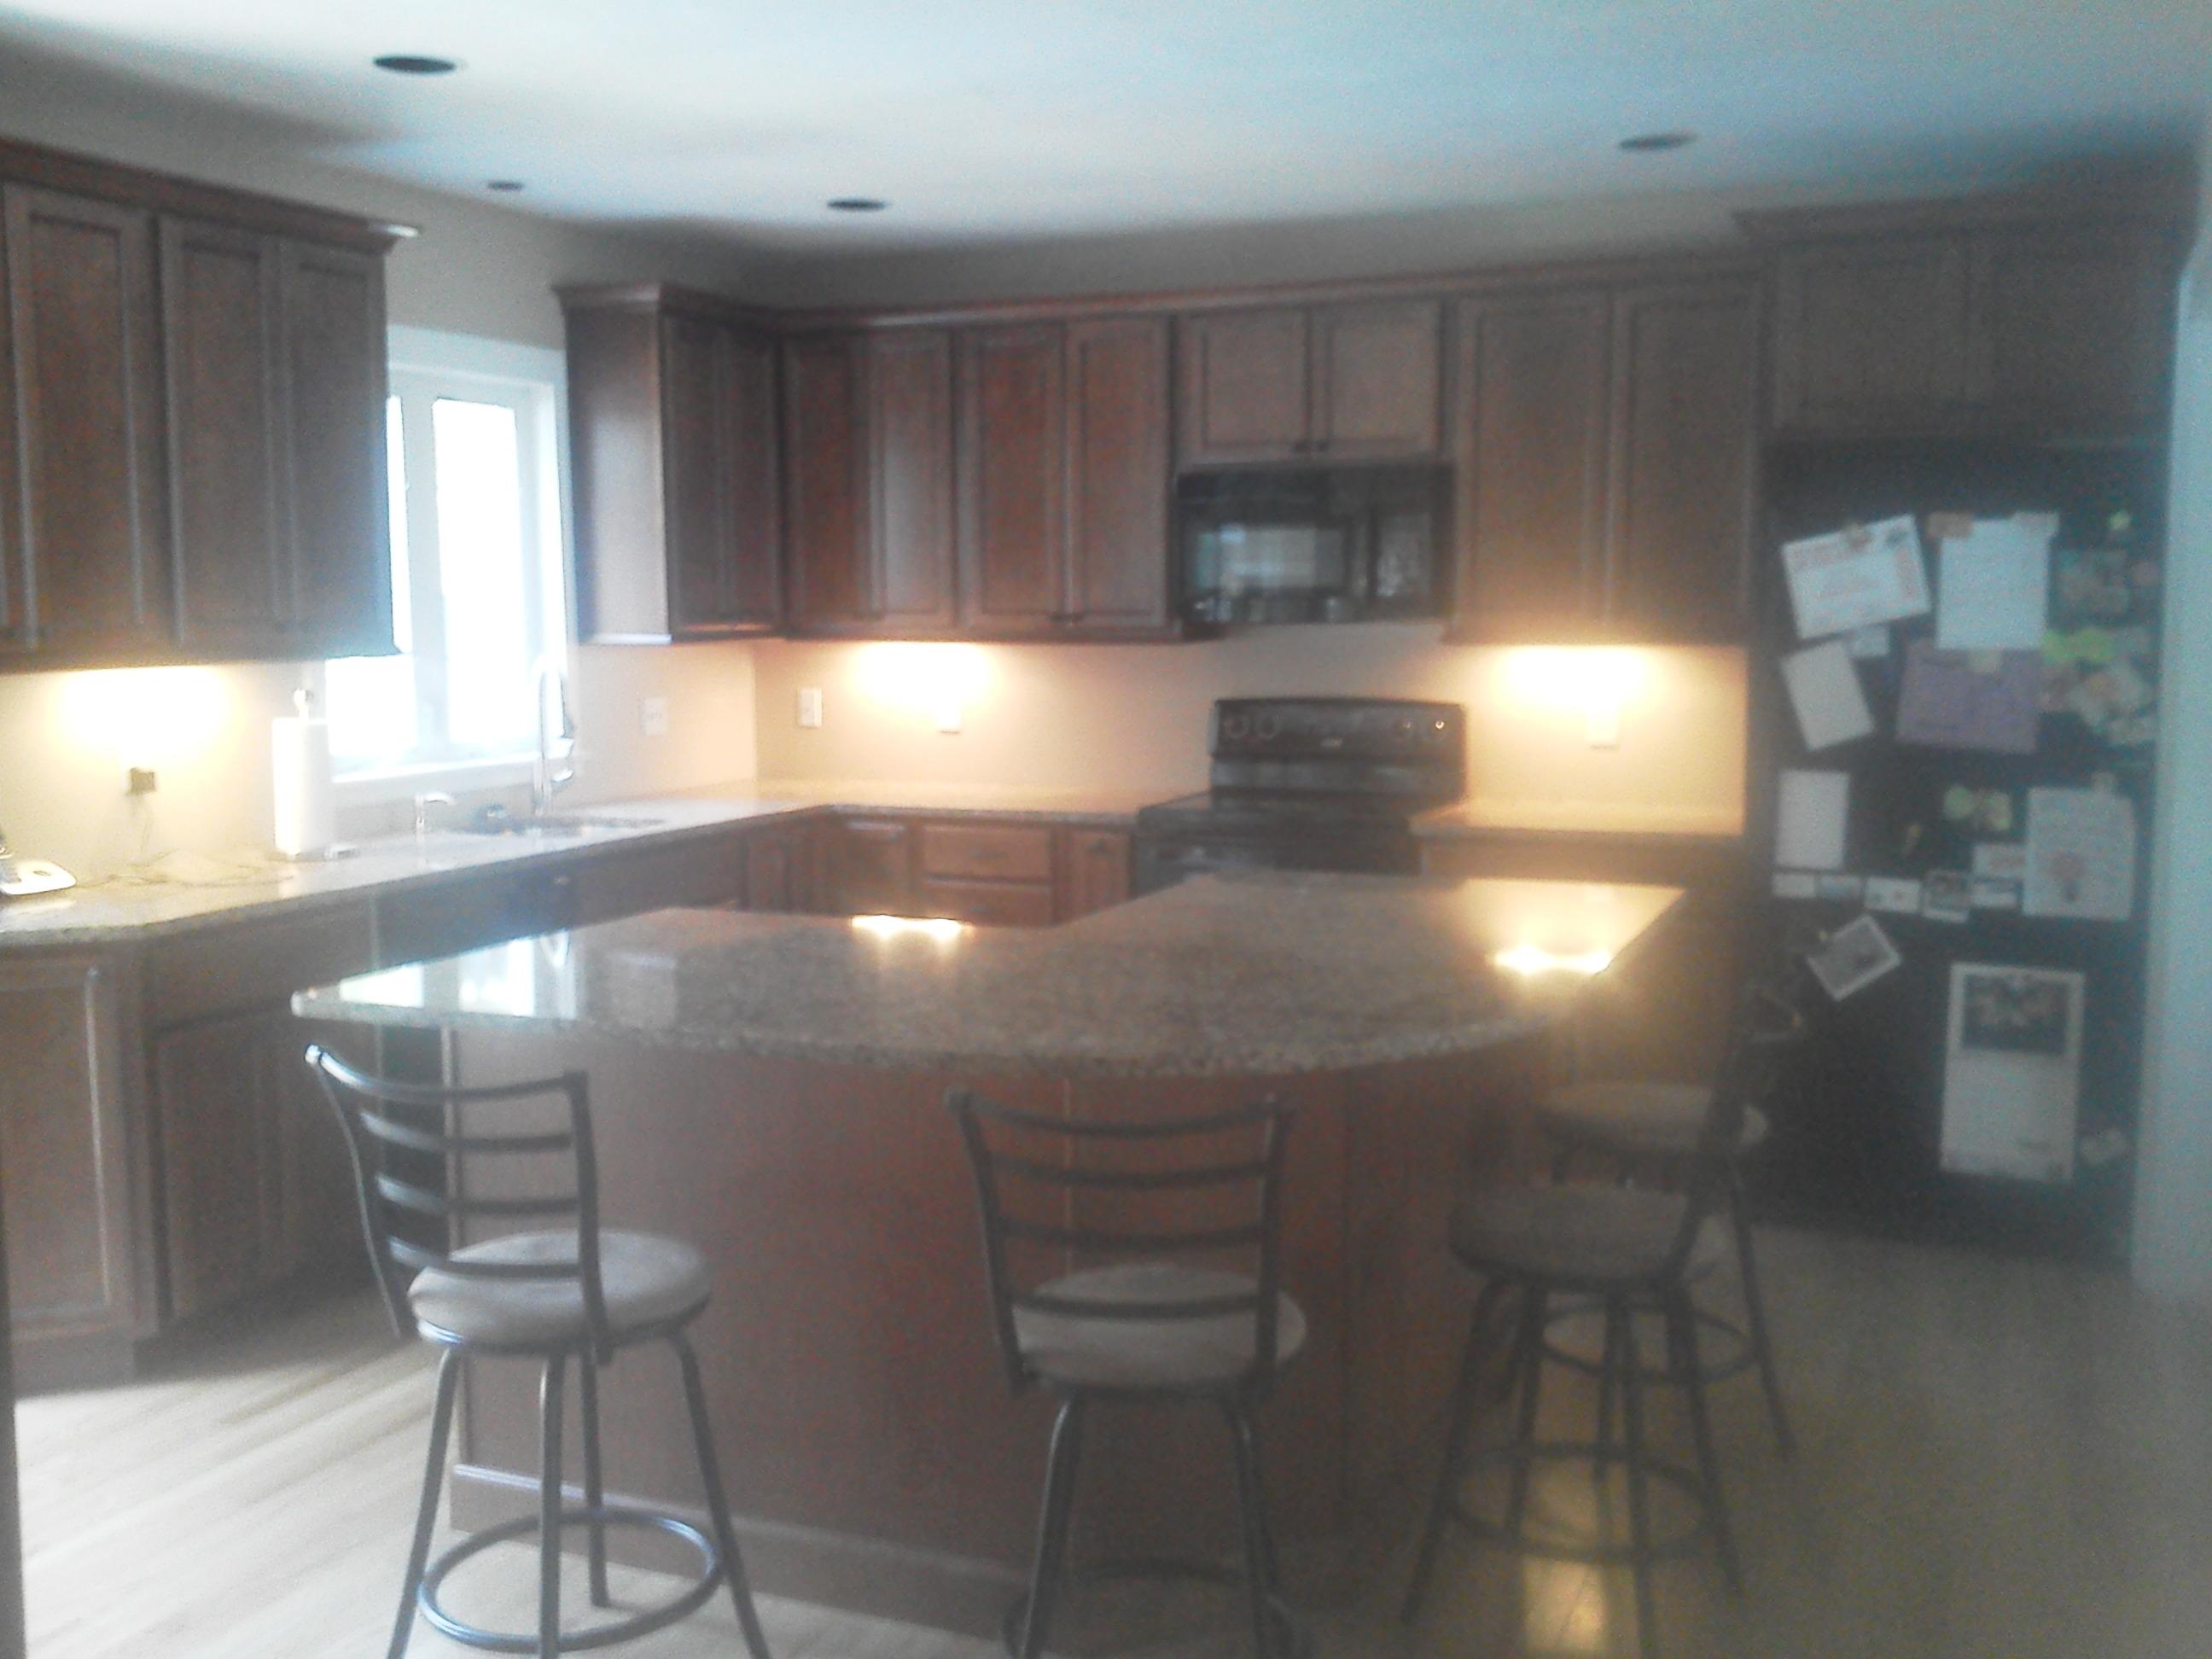 Boss Kitchens Baths Remodeling Bridgwater Taunton Middleboro Plymouth Massachusetts